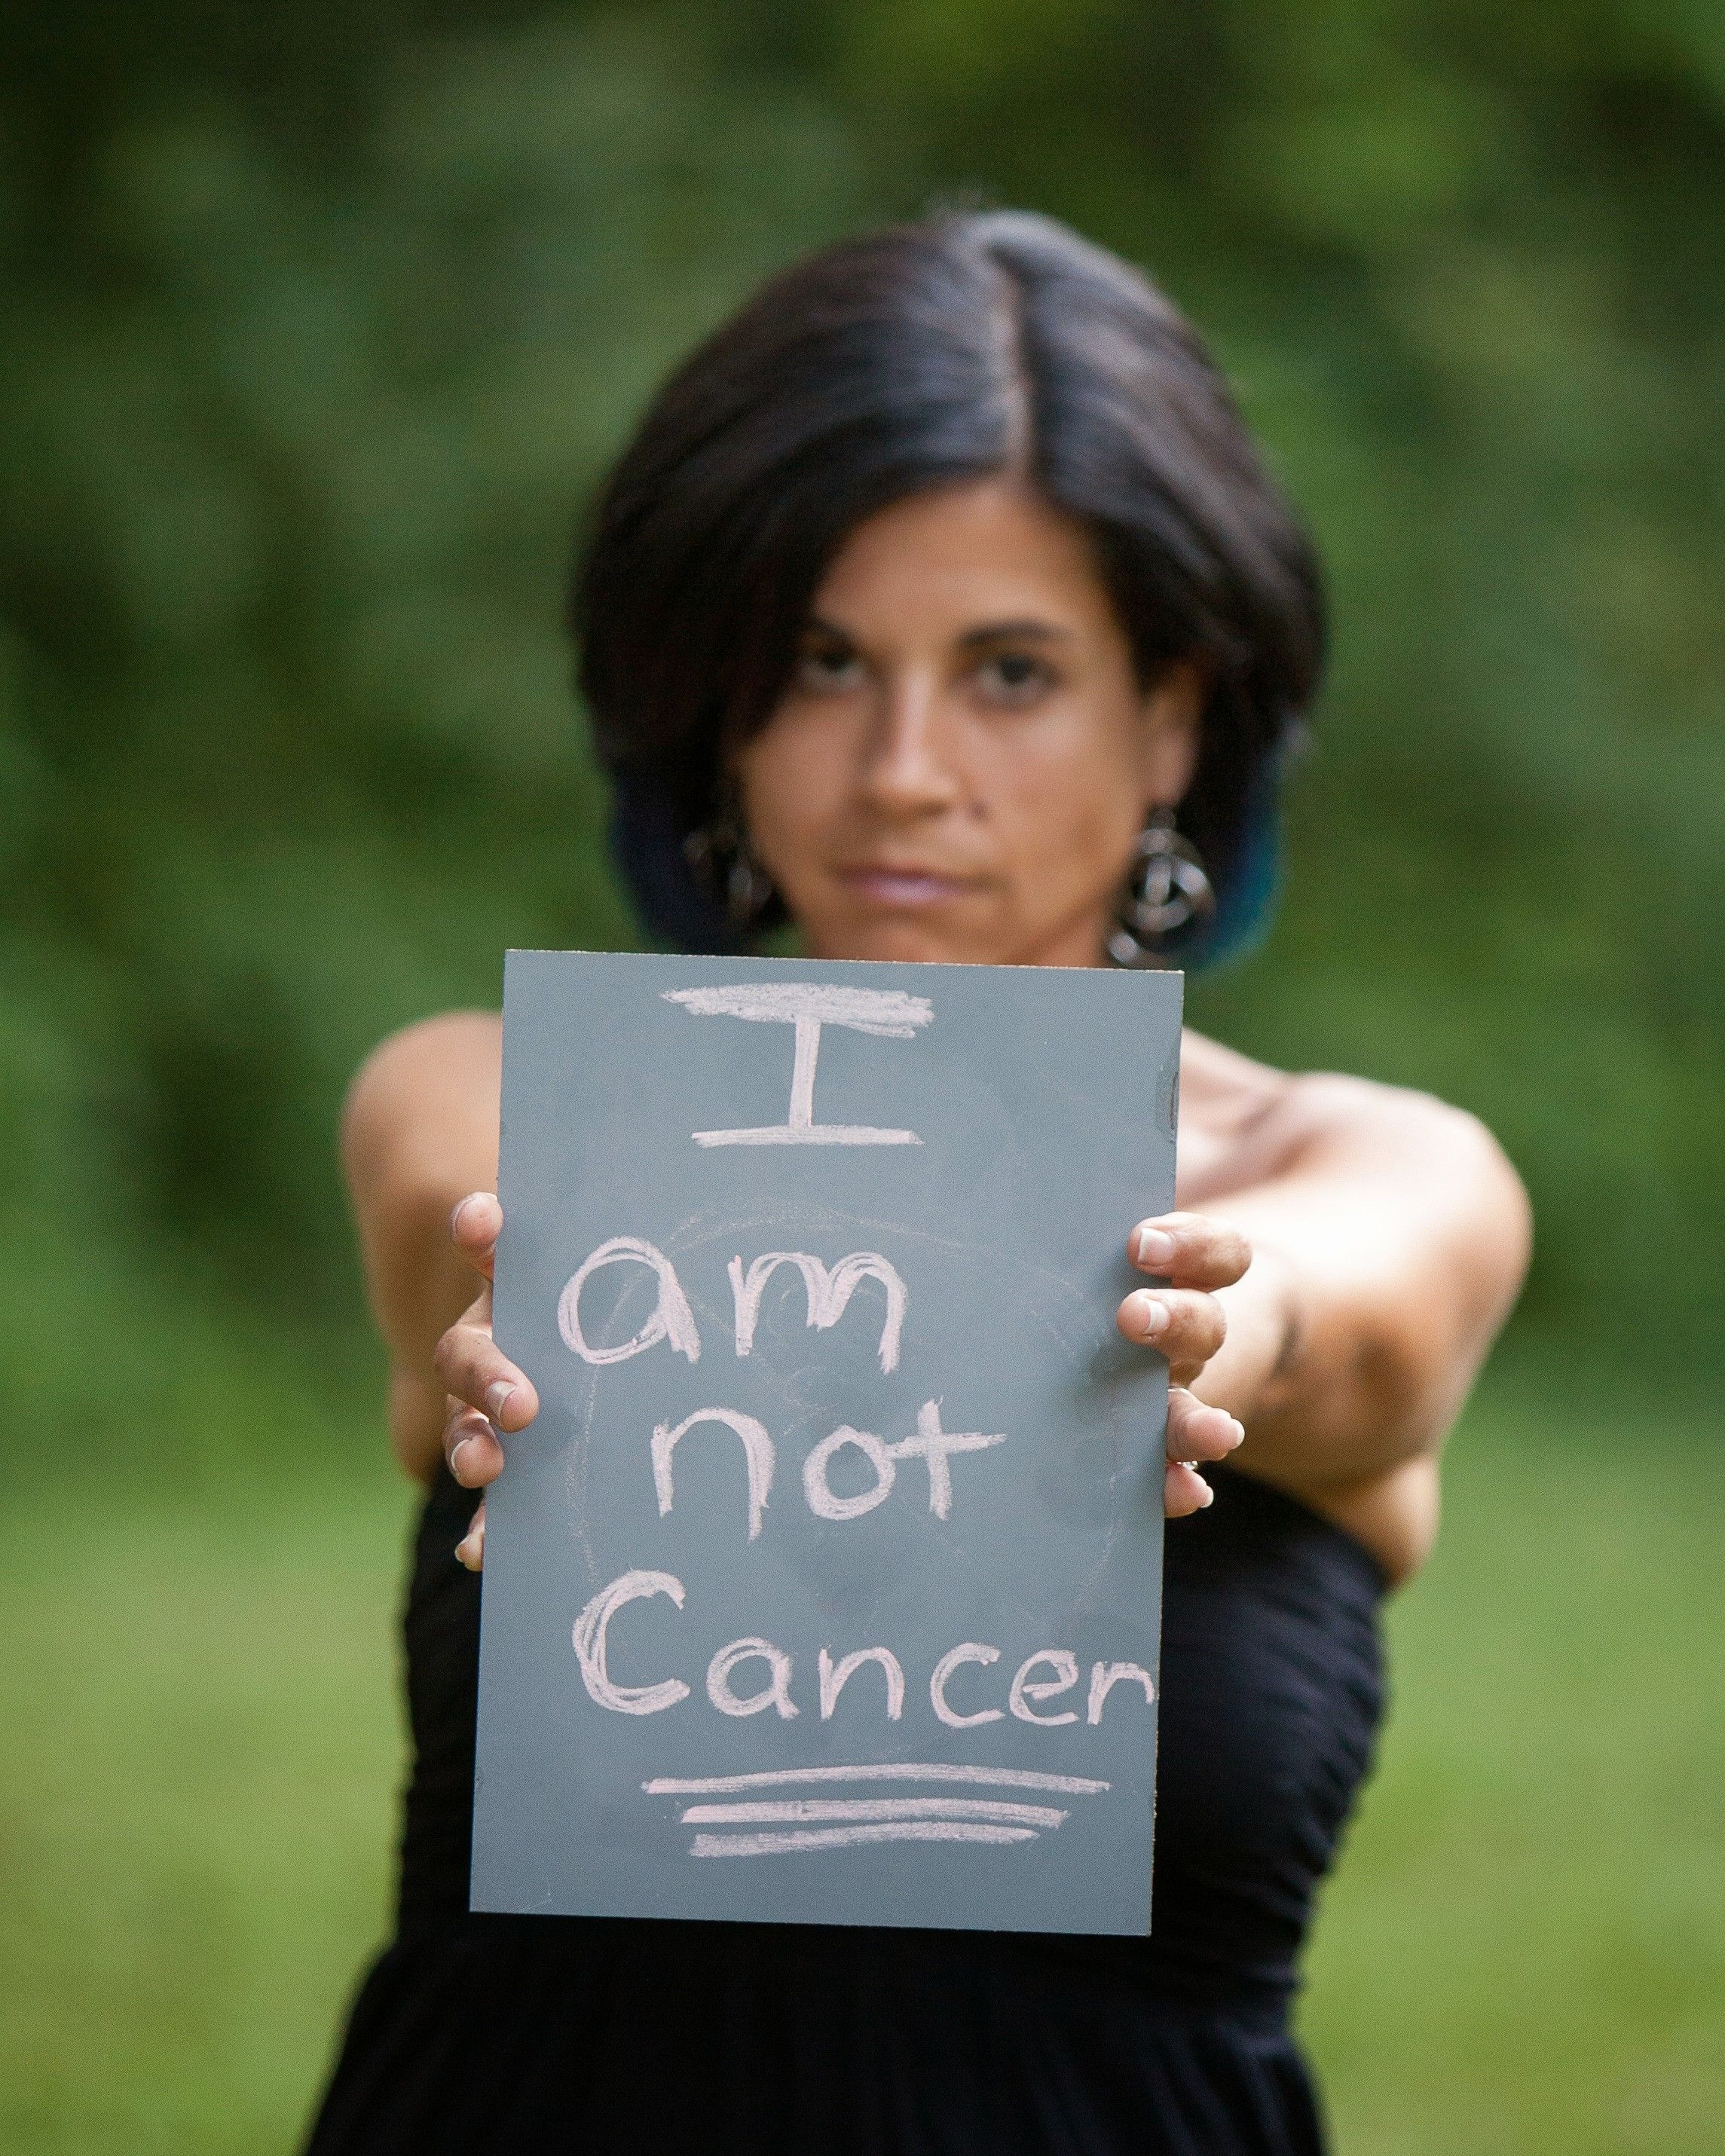 011: Annmarie Otis (founder of Stupid Dumb Breast Cancer